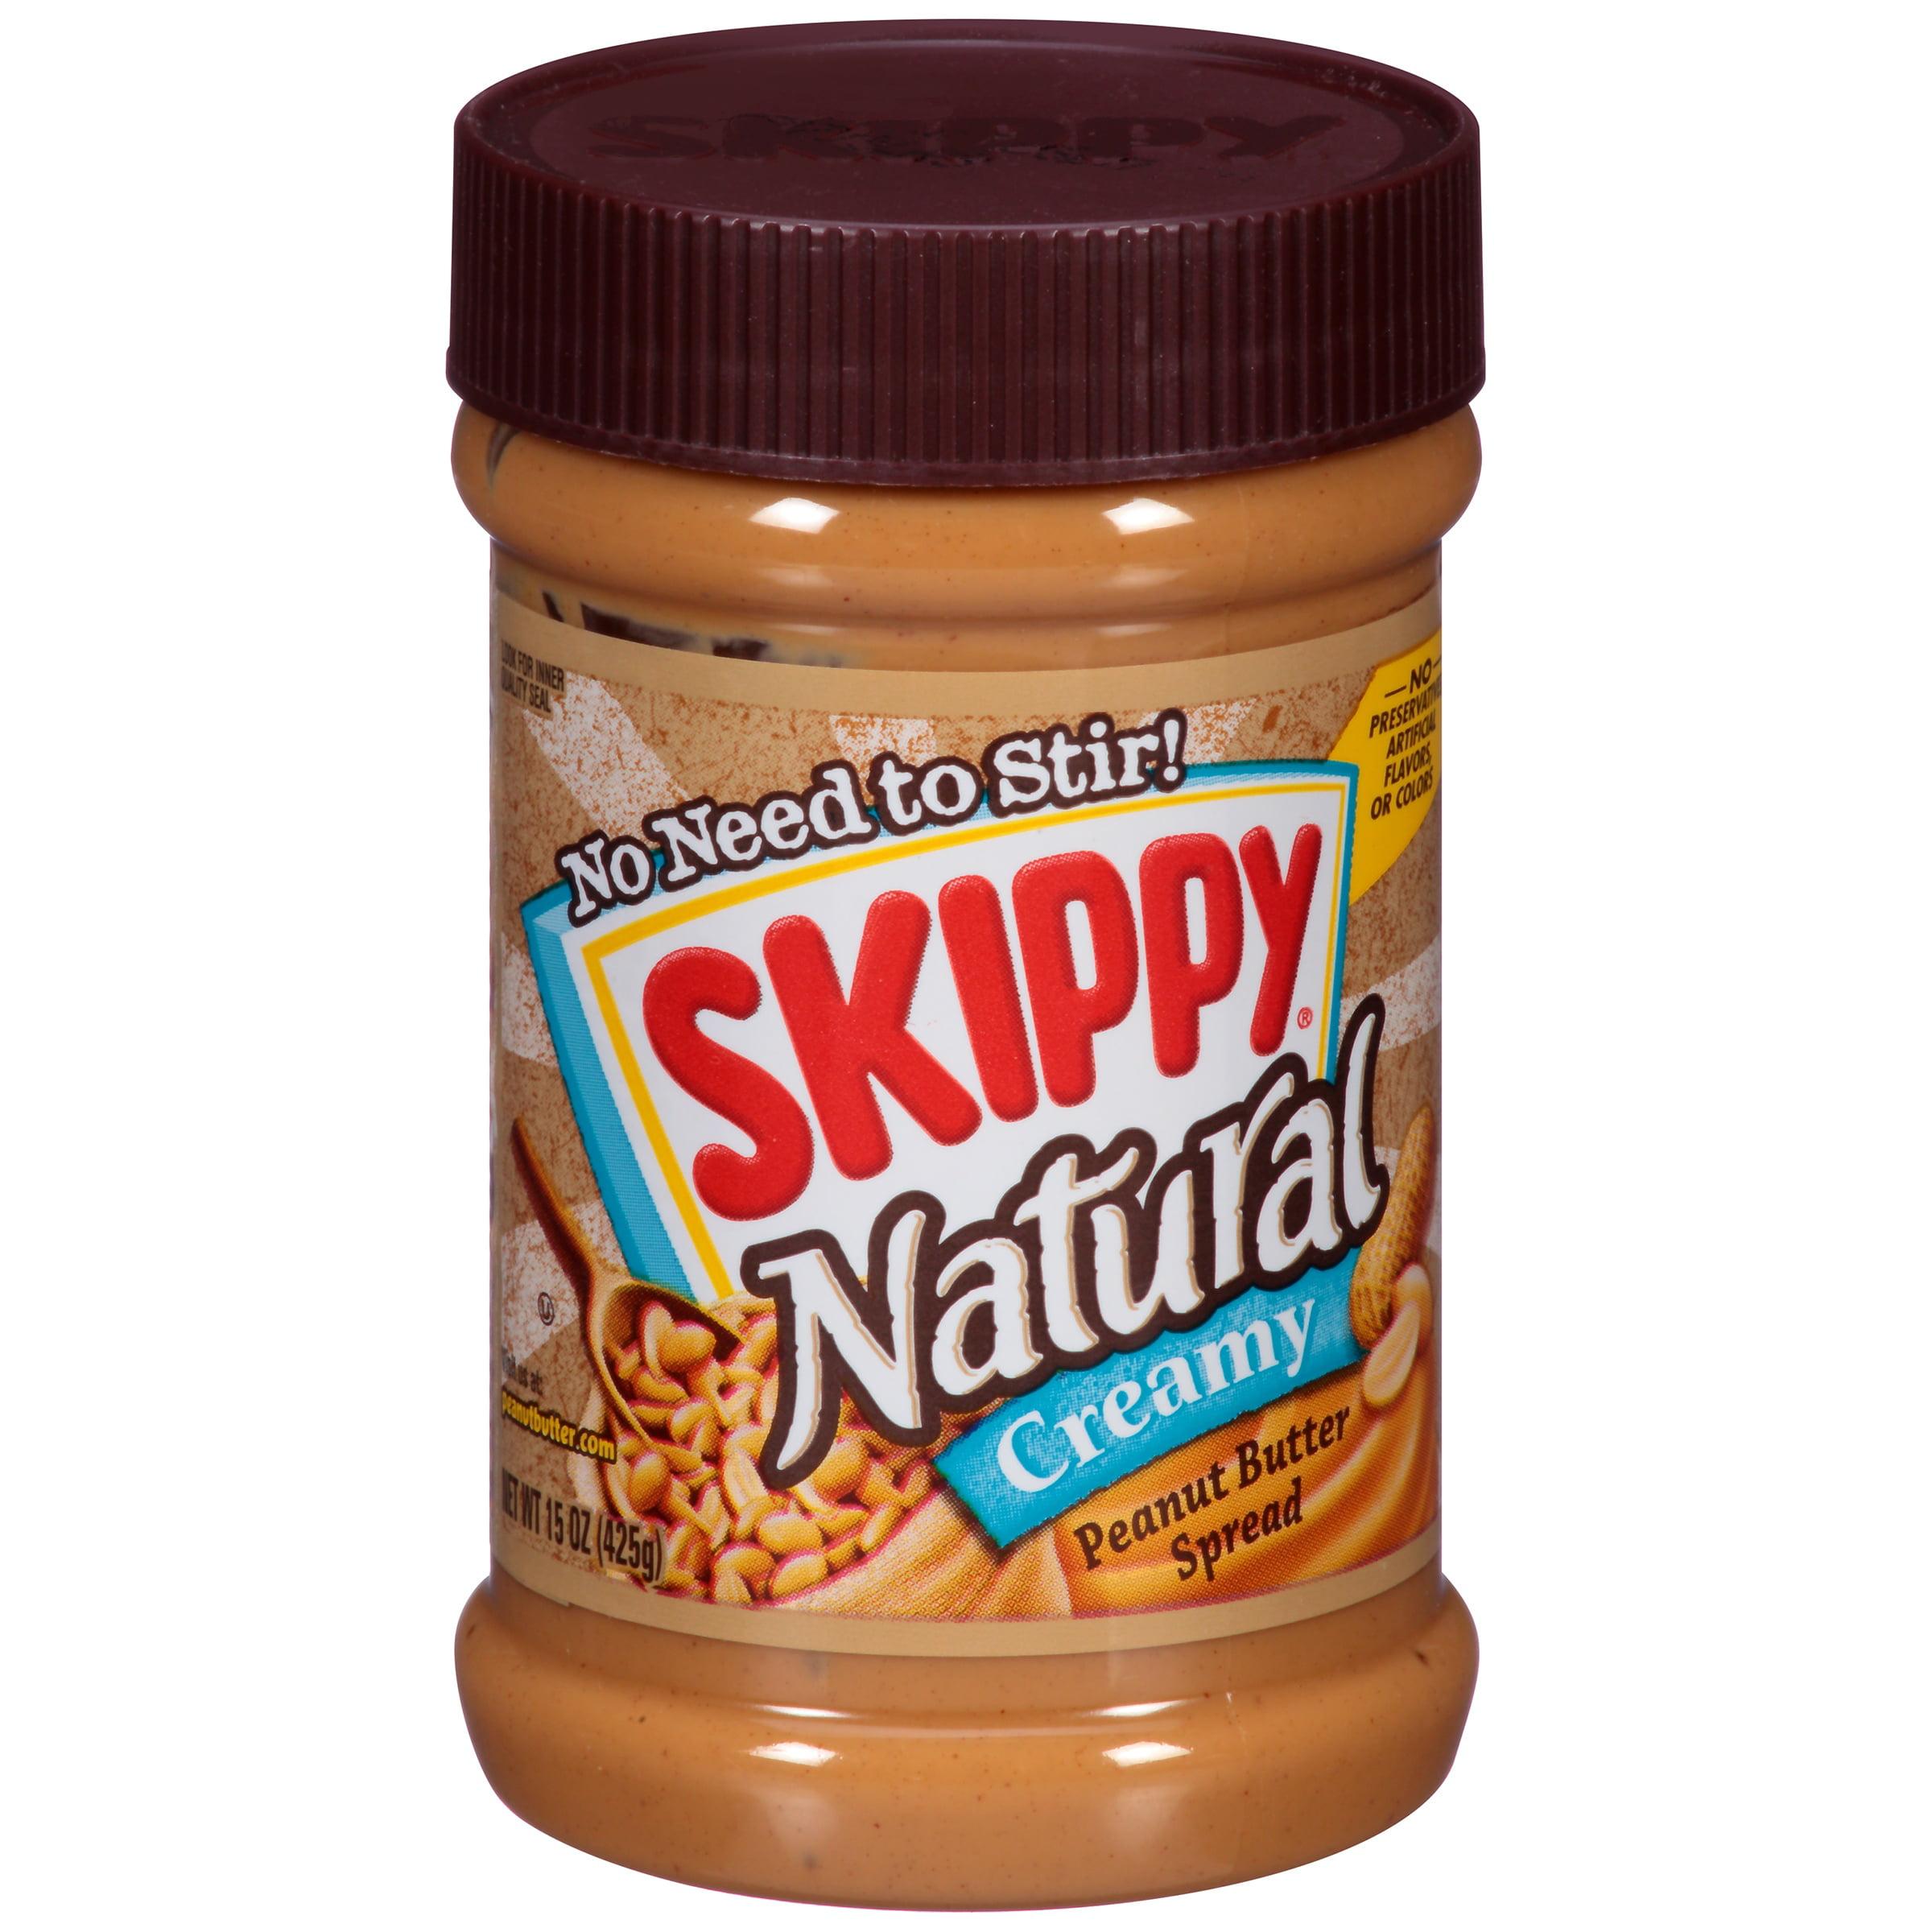 Skippy Natural Creamy Peanut Butter, 15 oz